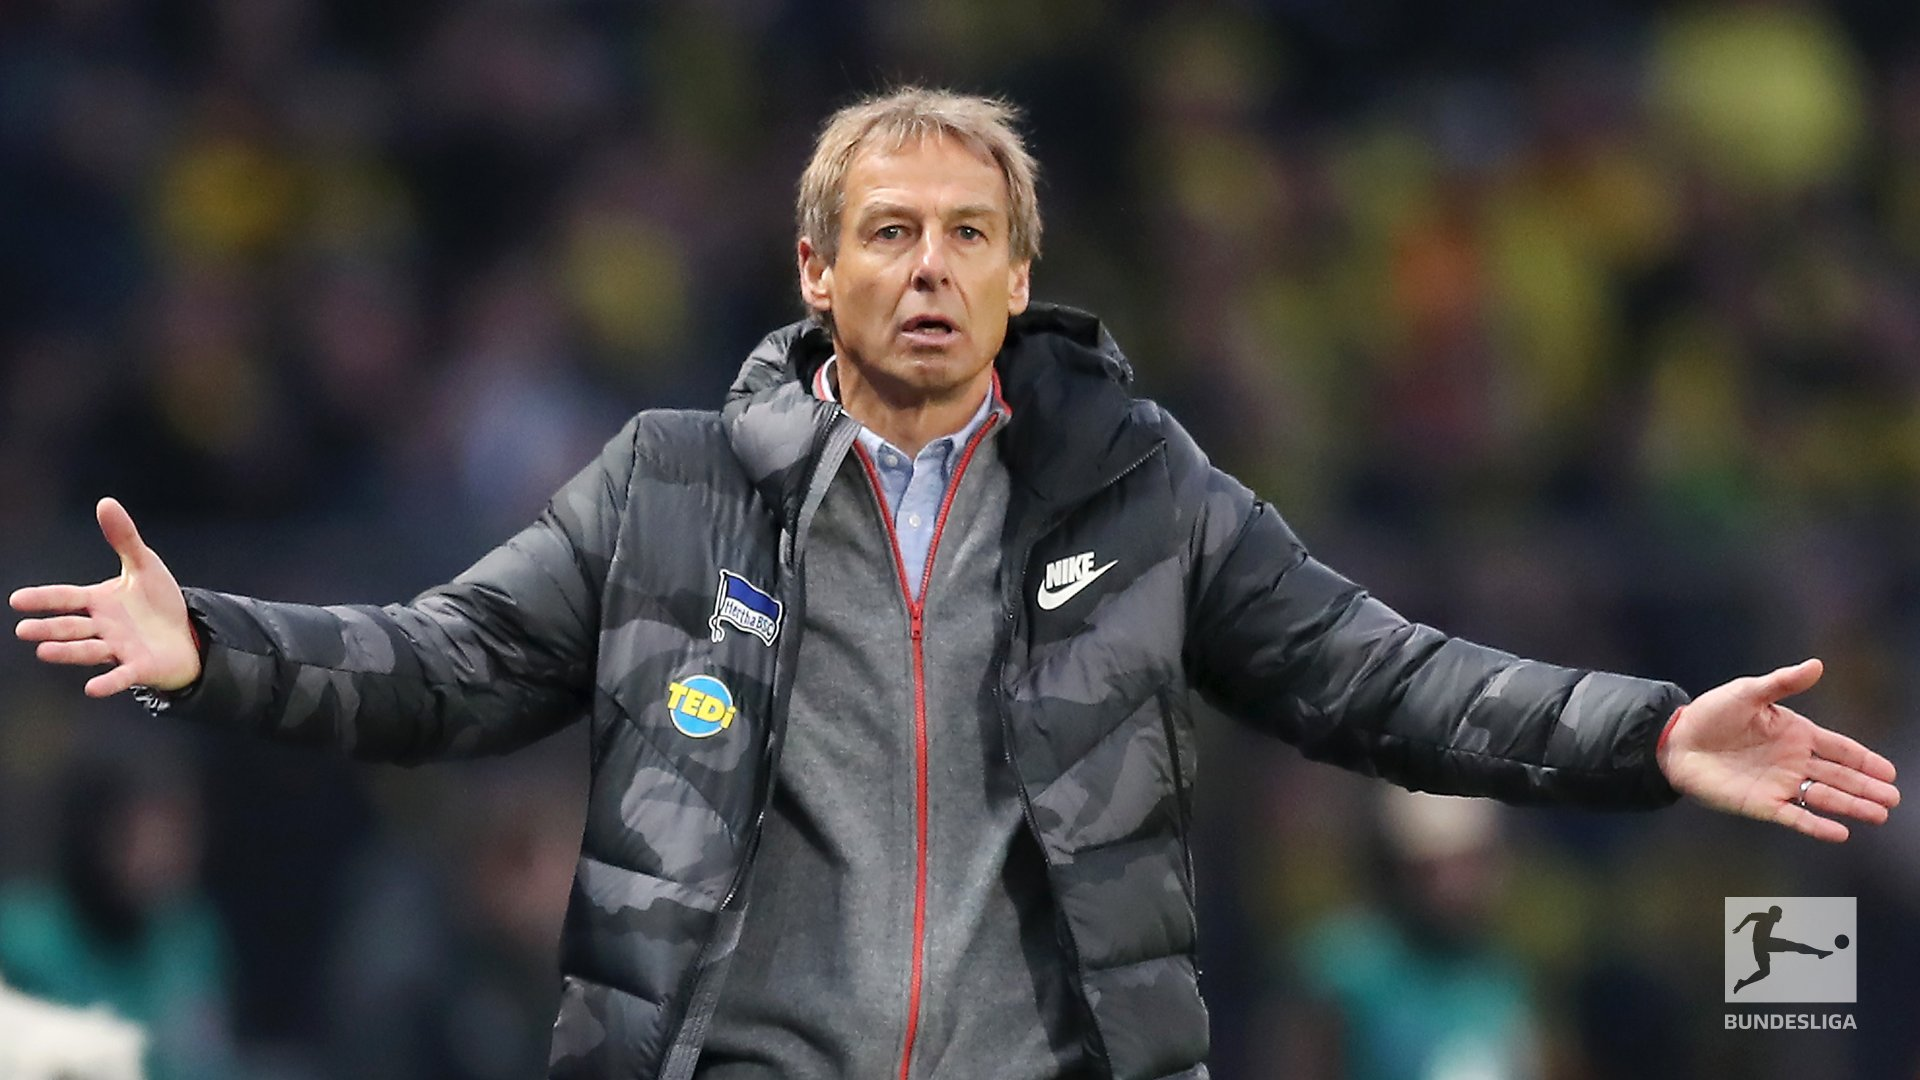 Bundesliga Matchday 15: Bayern Target Winning Streak; Klinsmann Eyes 1st Win as Hertha Coach